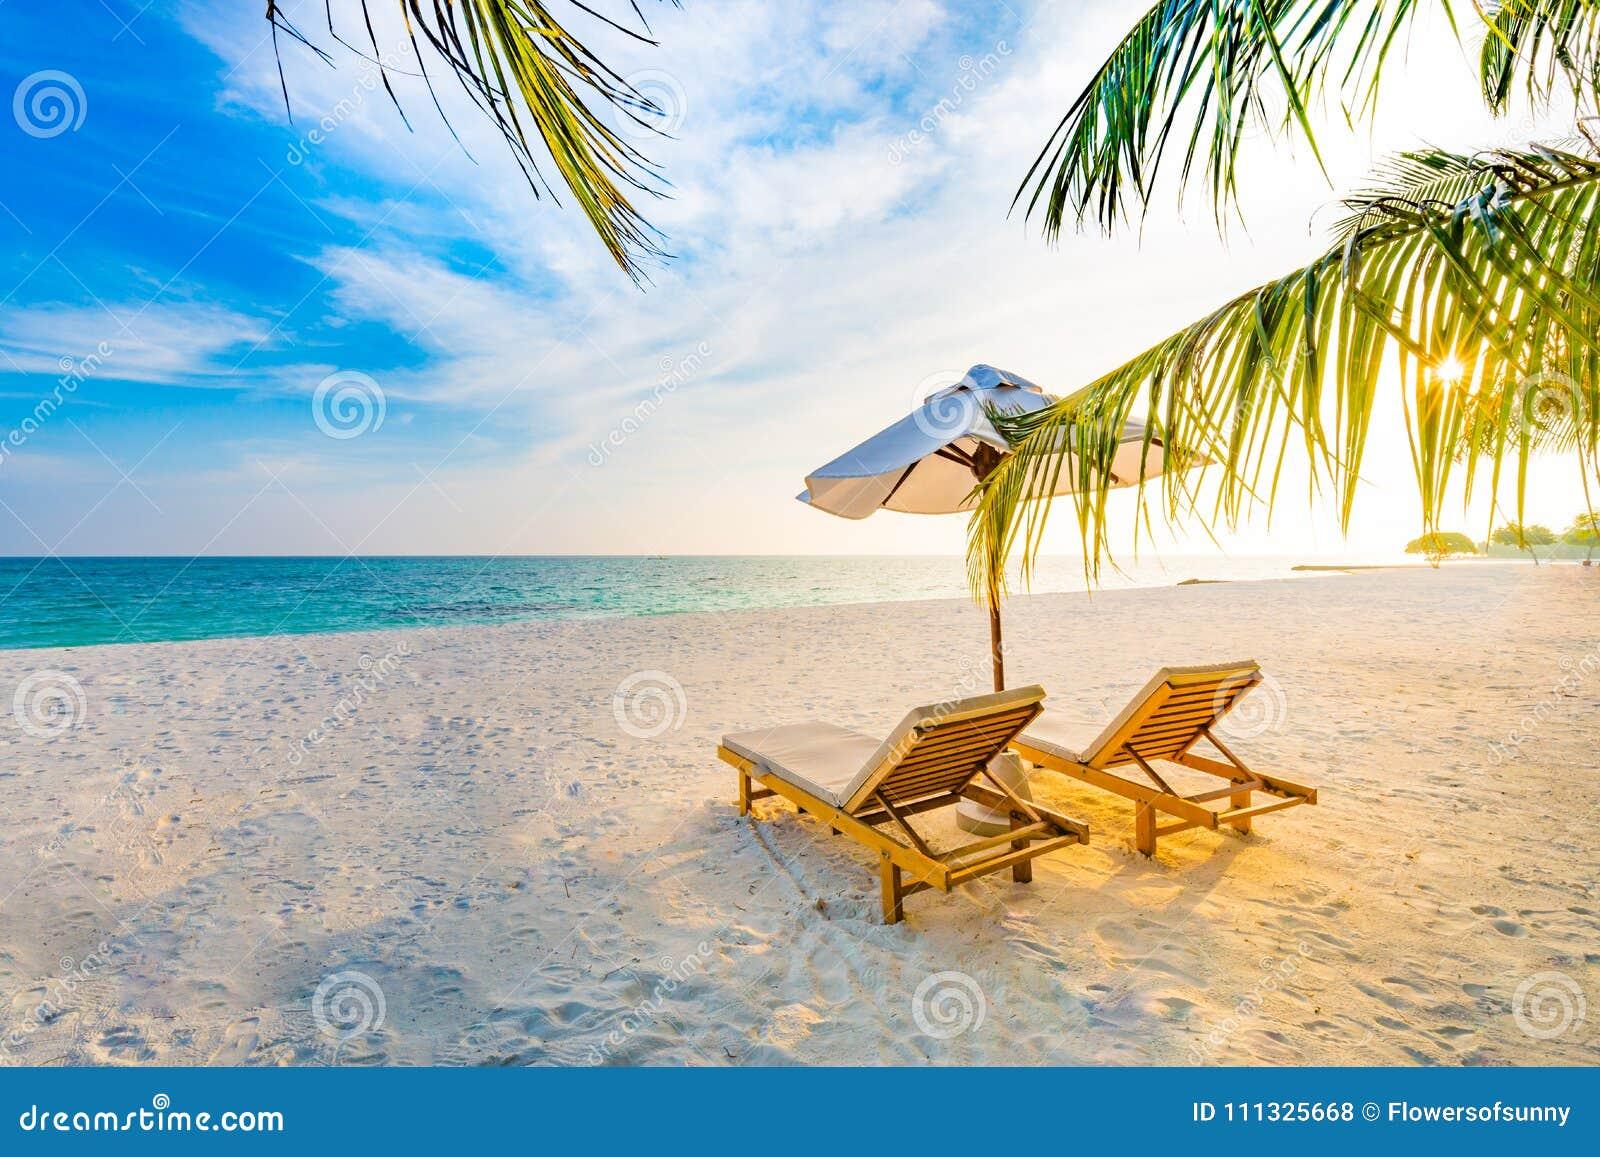 Summer Travel Destination Background Summer Beach Scene Sun Beds